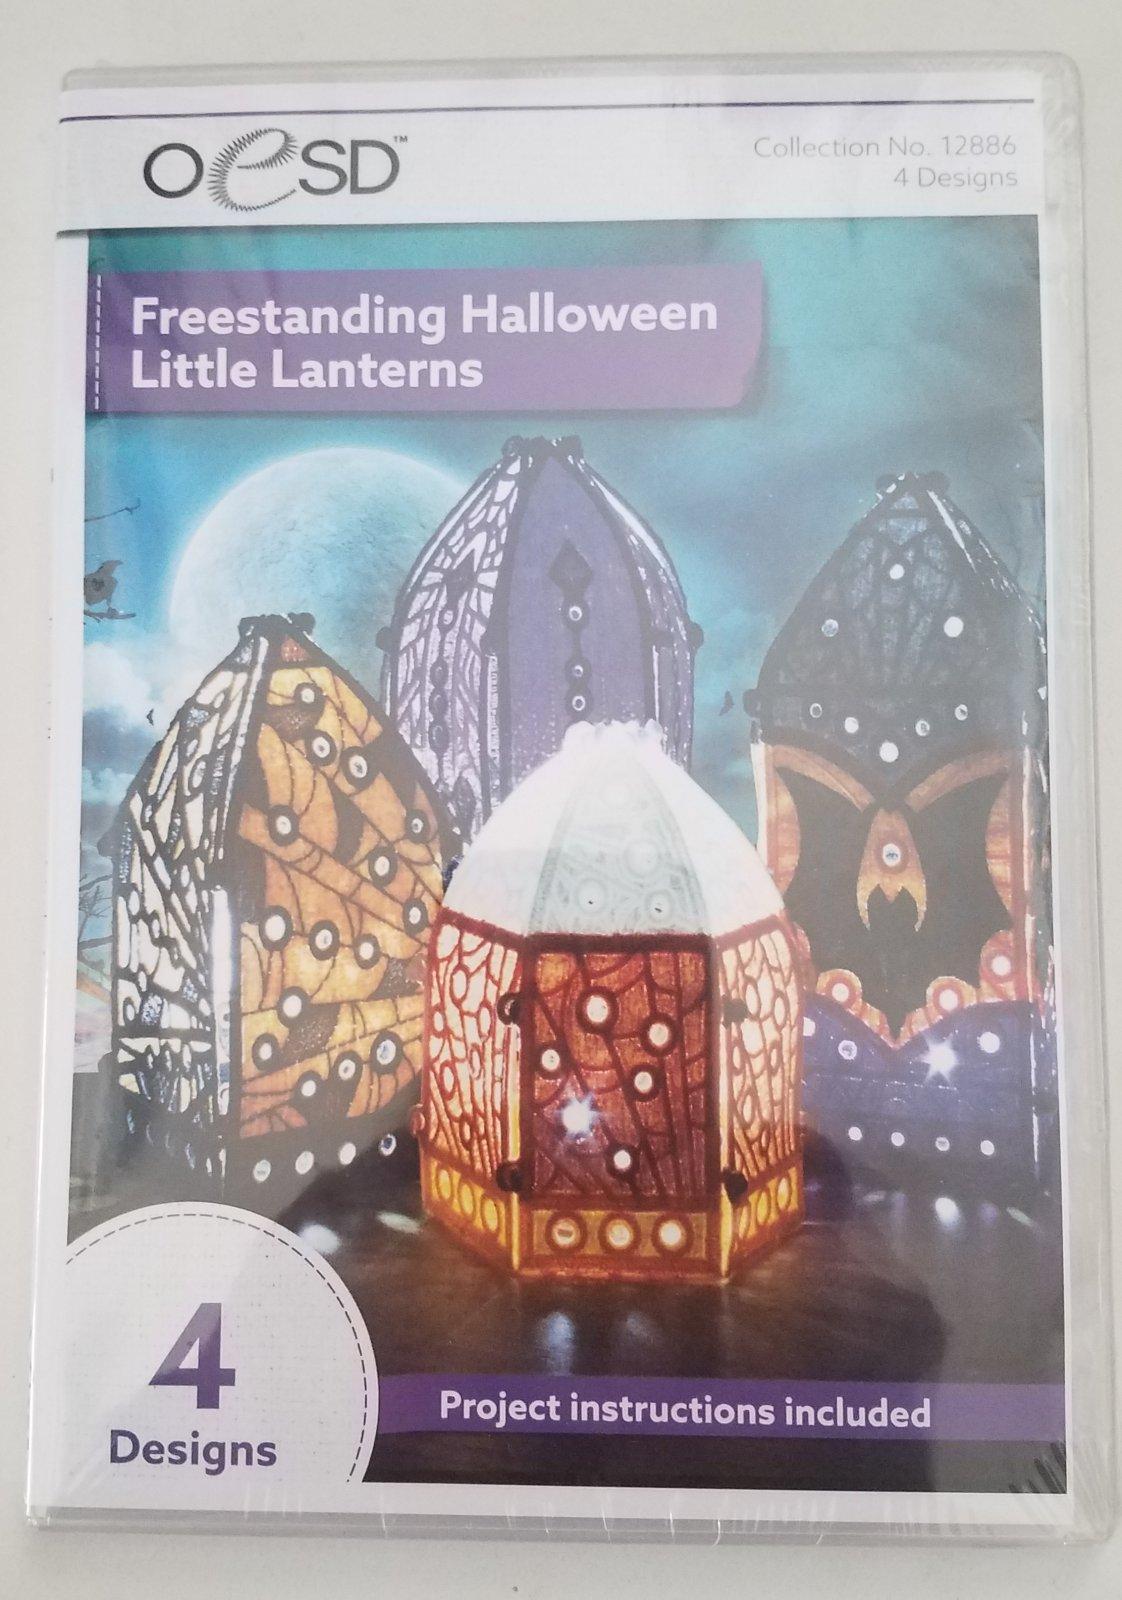 OESD Freestanding Halloween Little Lanterns Cd